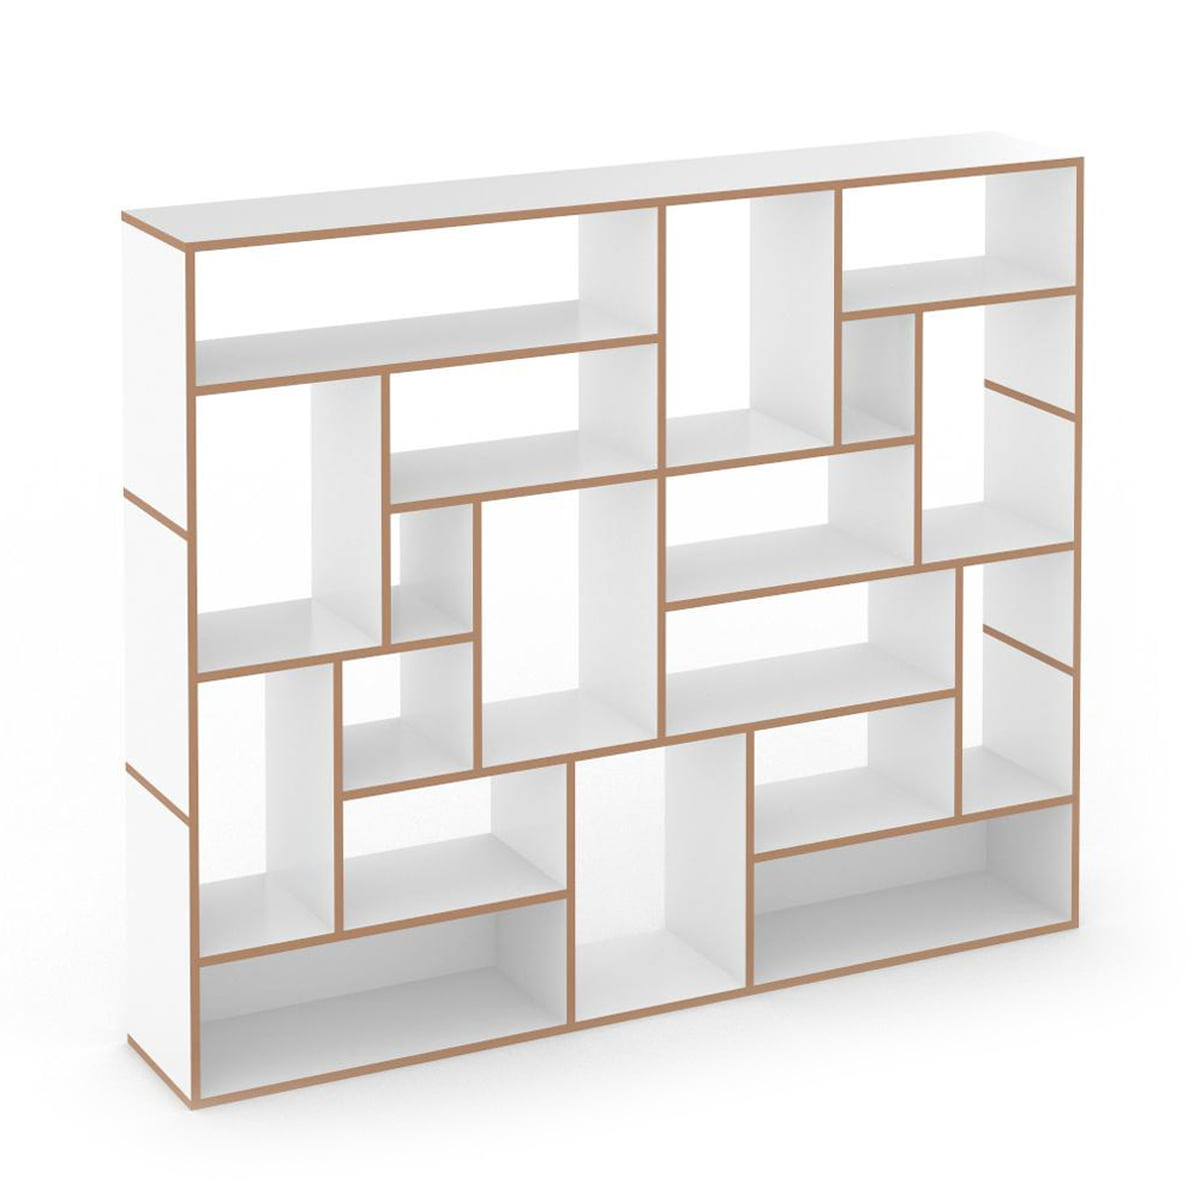 hanibal regal von tojo im shop kaufen. Black Bedroom Furniture Sets. Home Design Ideas